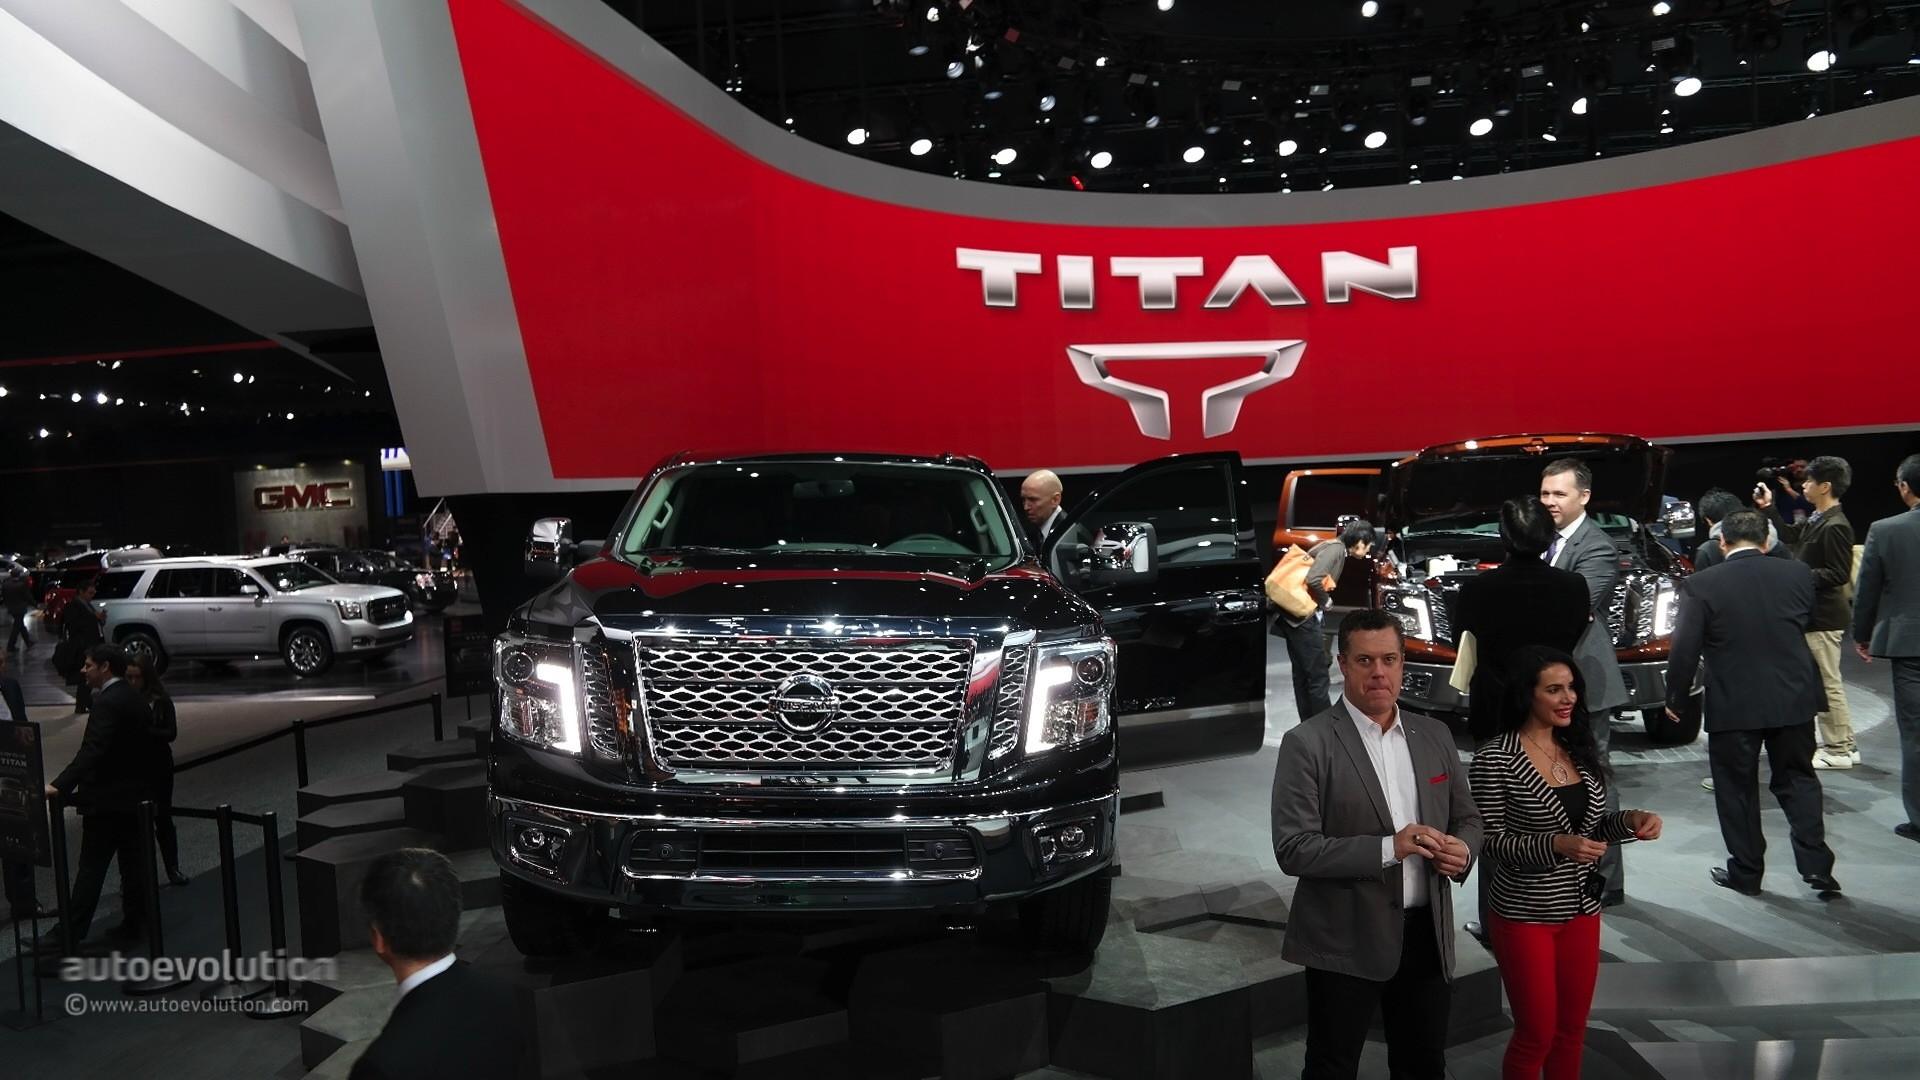 2016 Nissan Titan Xd Cummins Light Duty Truck Has Heavy